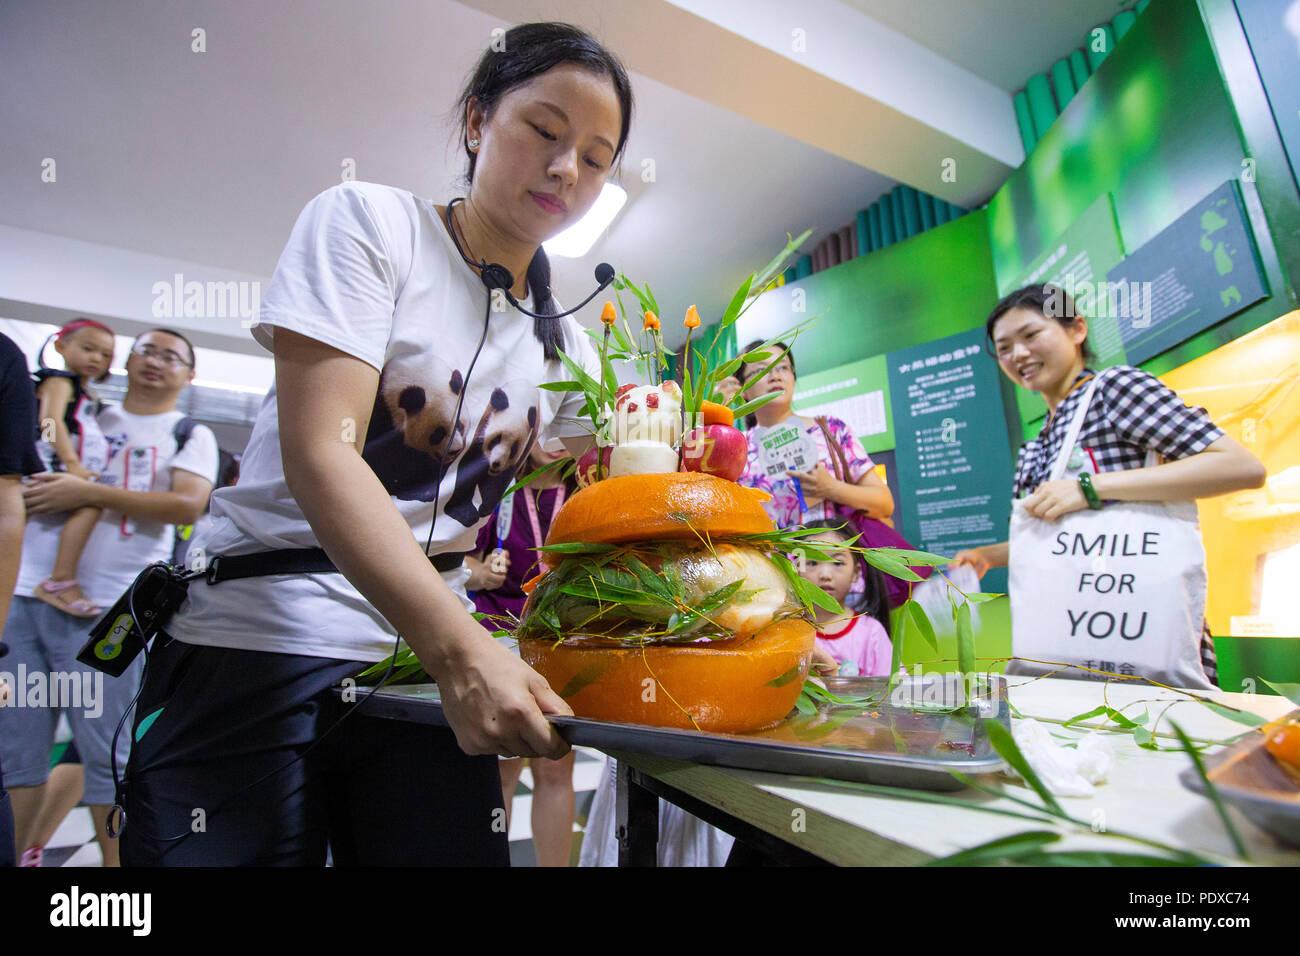 Nanjing, China's Jiangsu Province. 10th Aug, 2018. A staff worker shows a birthday cake prepared for the giant panda twins Hehe and Jiujiu at the Nanjing Hongshan Forest Zoo in Nanjing, capital of east China's Jiangsu Province, Aug. 10, 2018. Staff workers at the zoo celebrated the 3rd birthday anniversary for the female giant panda twins 'Hehe' and 'Jiujiu' on Friday. Credit: Su Yang/Xinhua/Alamy Live News - Stock Image